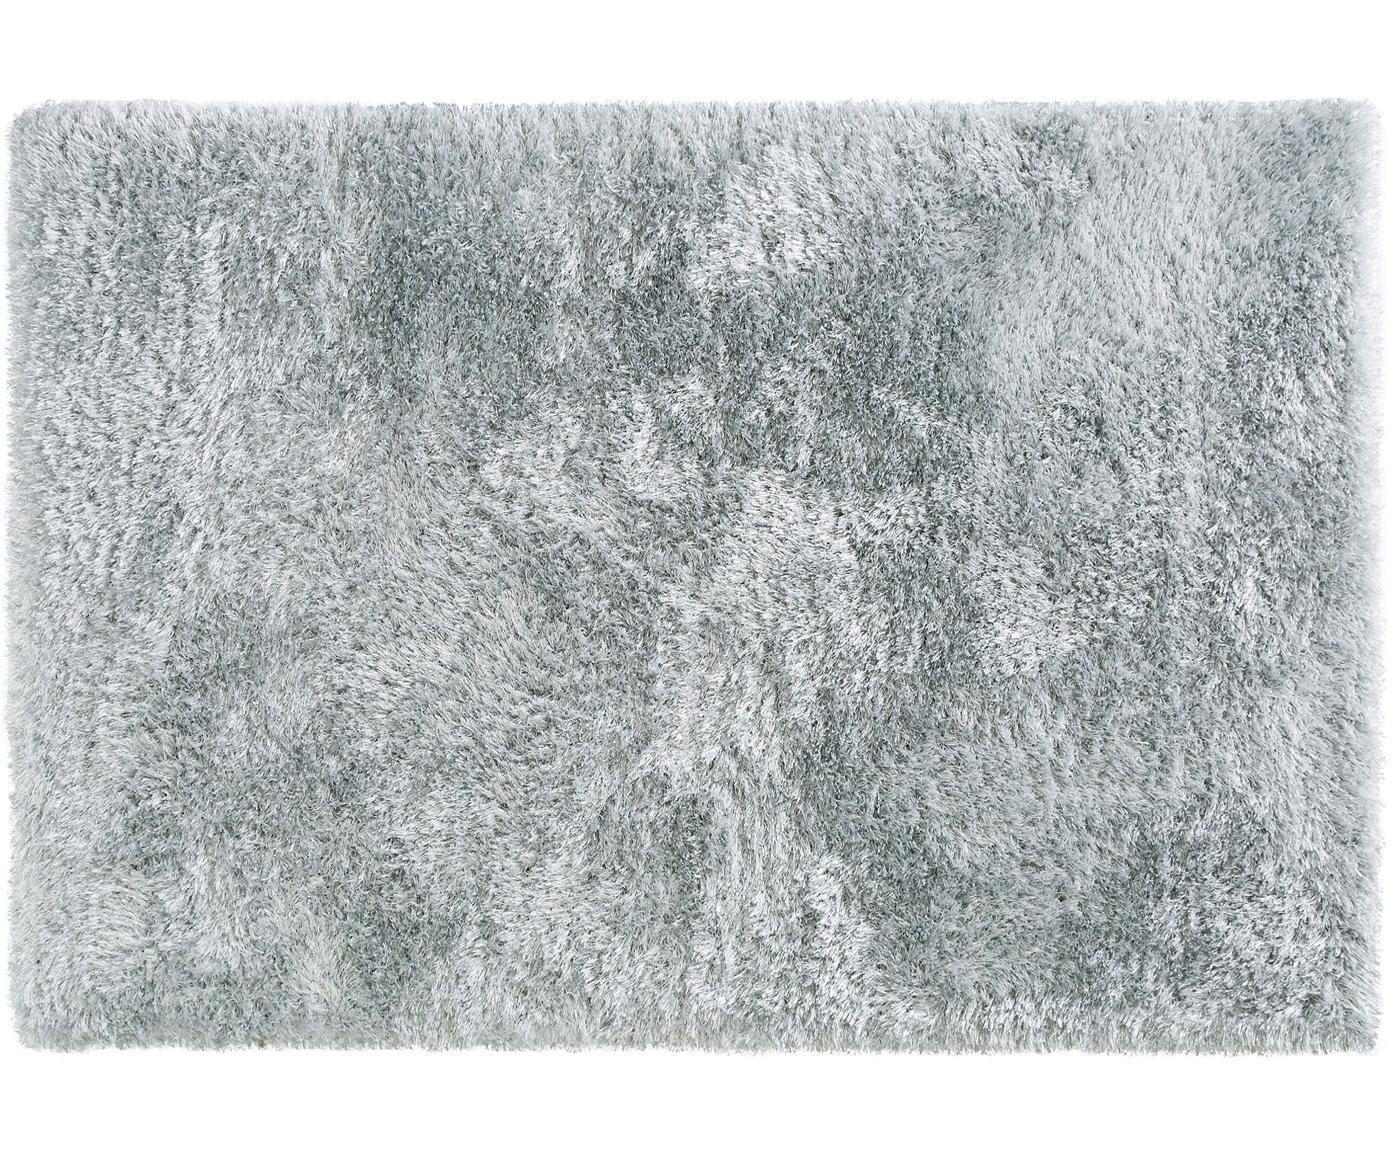 Alfombra de pelo largo Lea, 50%poliéster, 50%polipropileno, Azul claro, An 160 x L 230 cm (Tamaño M)